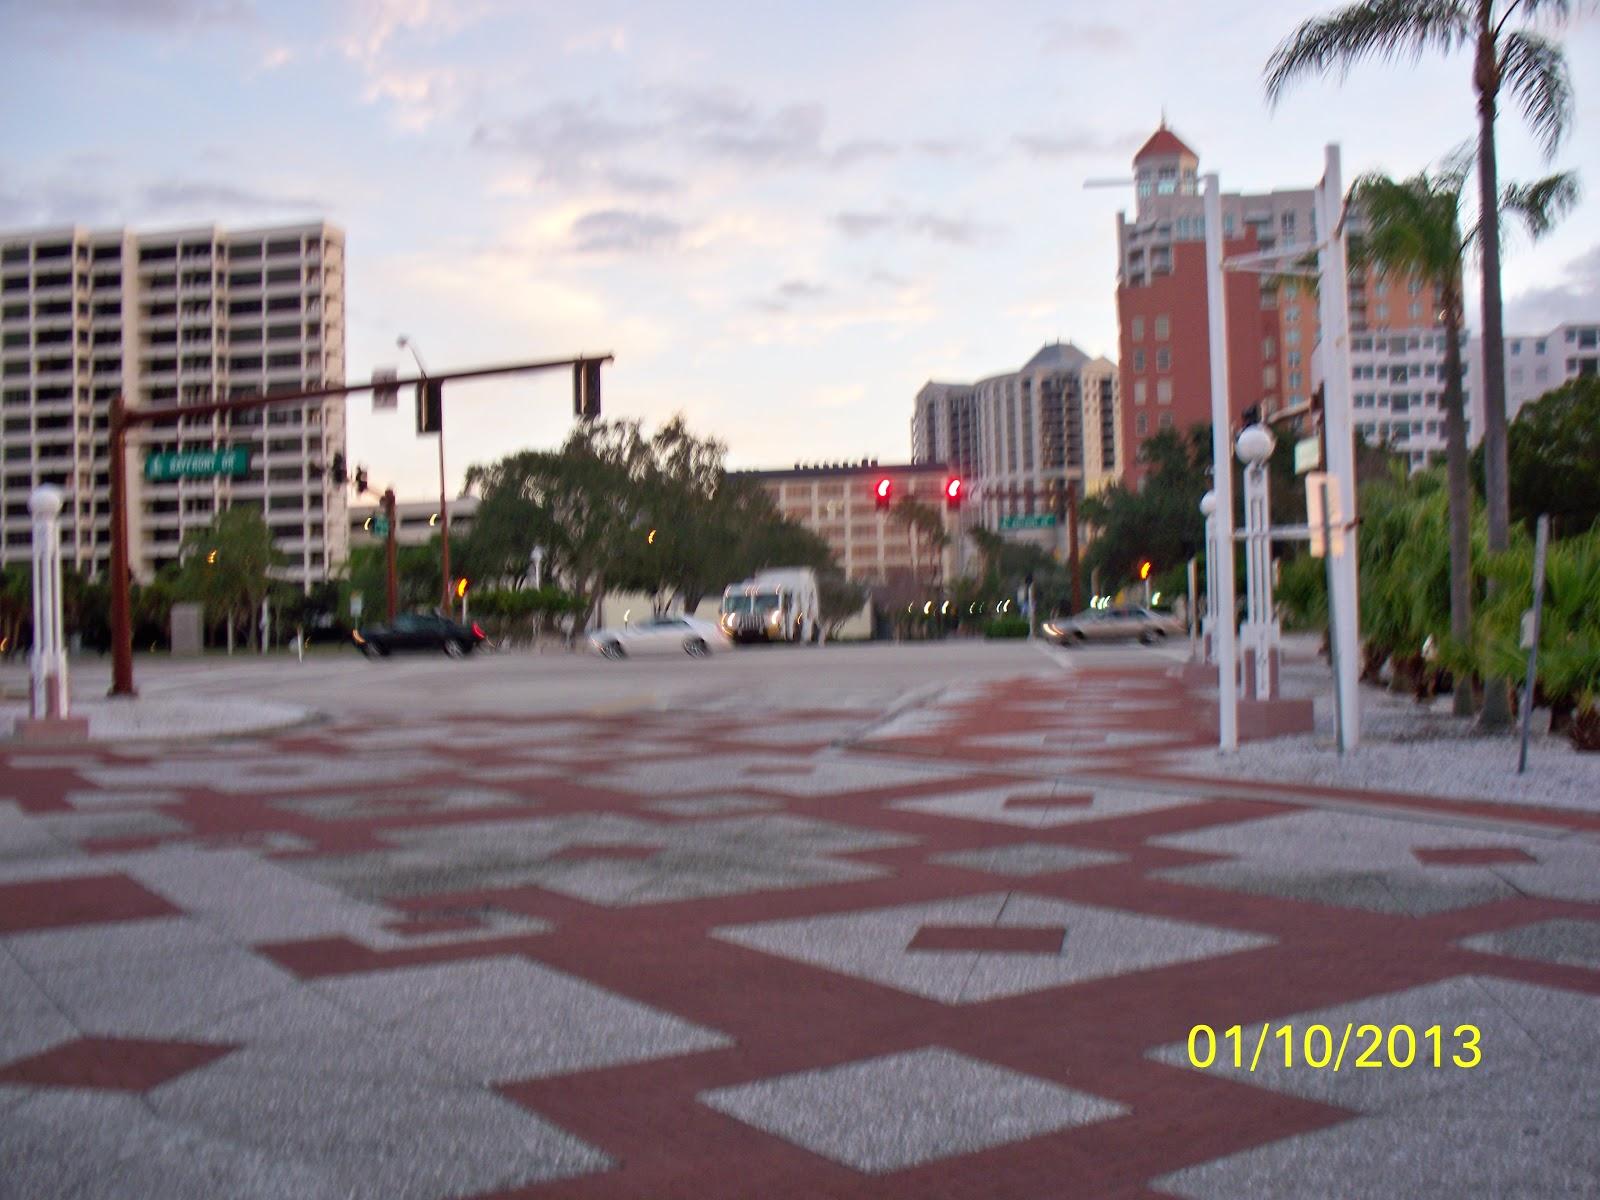 Nanseann: Day 89 Jan 11 38 mi Palm Island Marina, Englewood FL